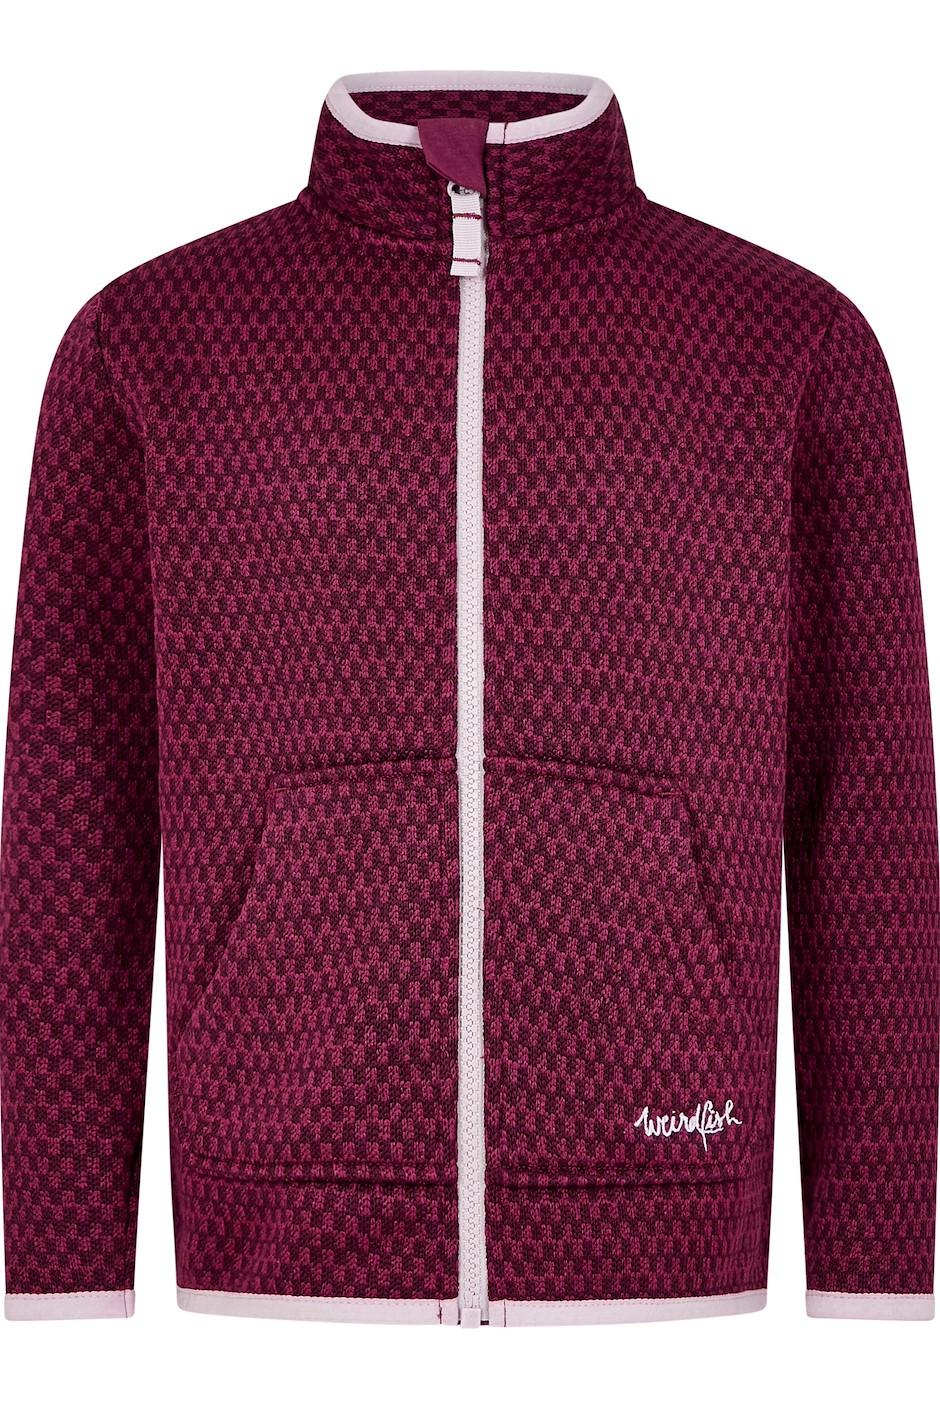 Warble Full Zip Textured Fleece Purple Potion (Size Age 14)